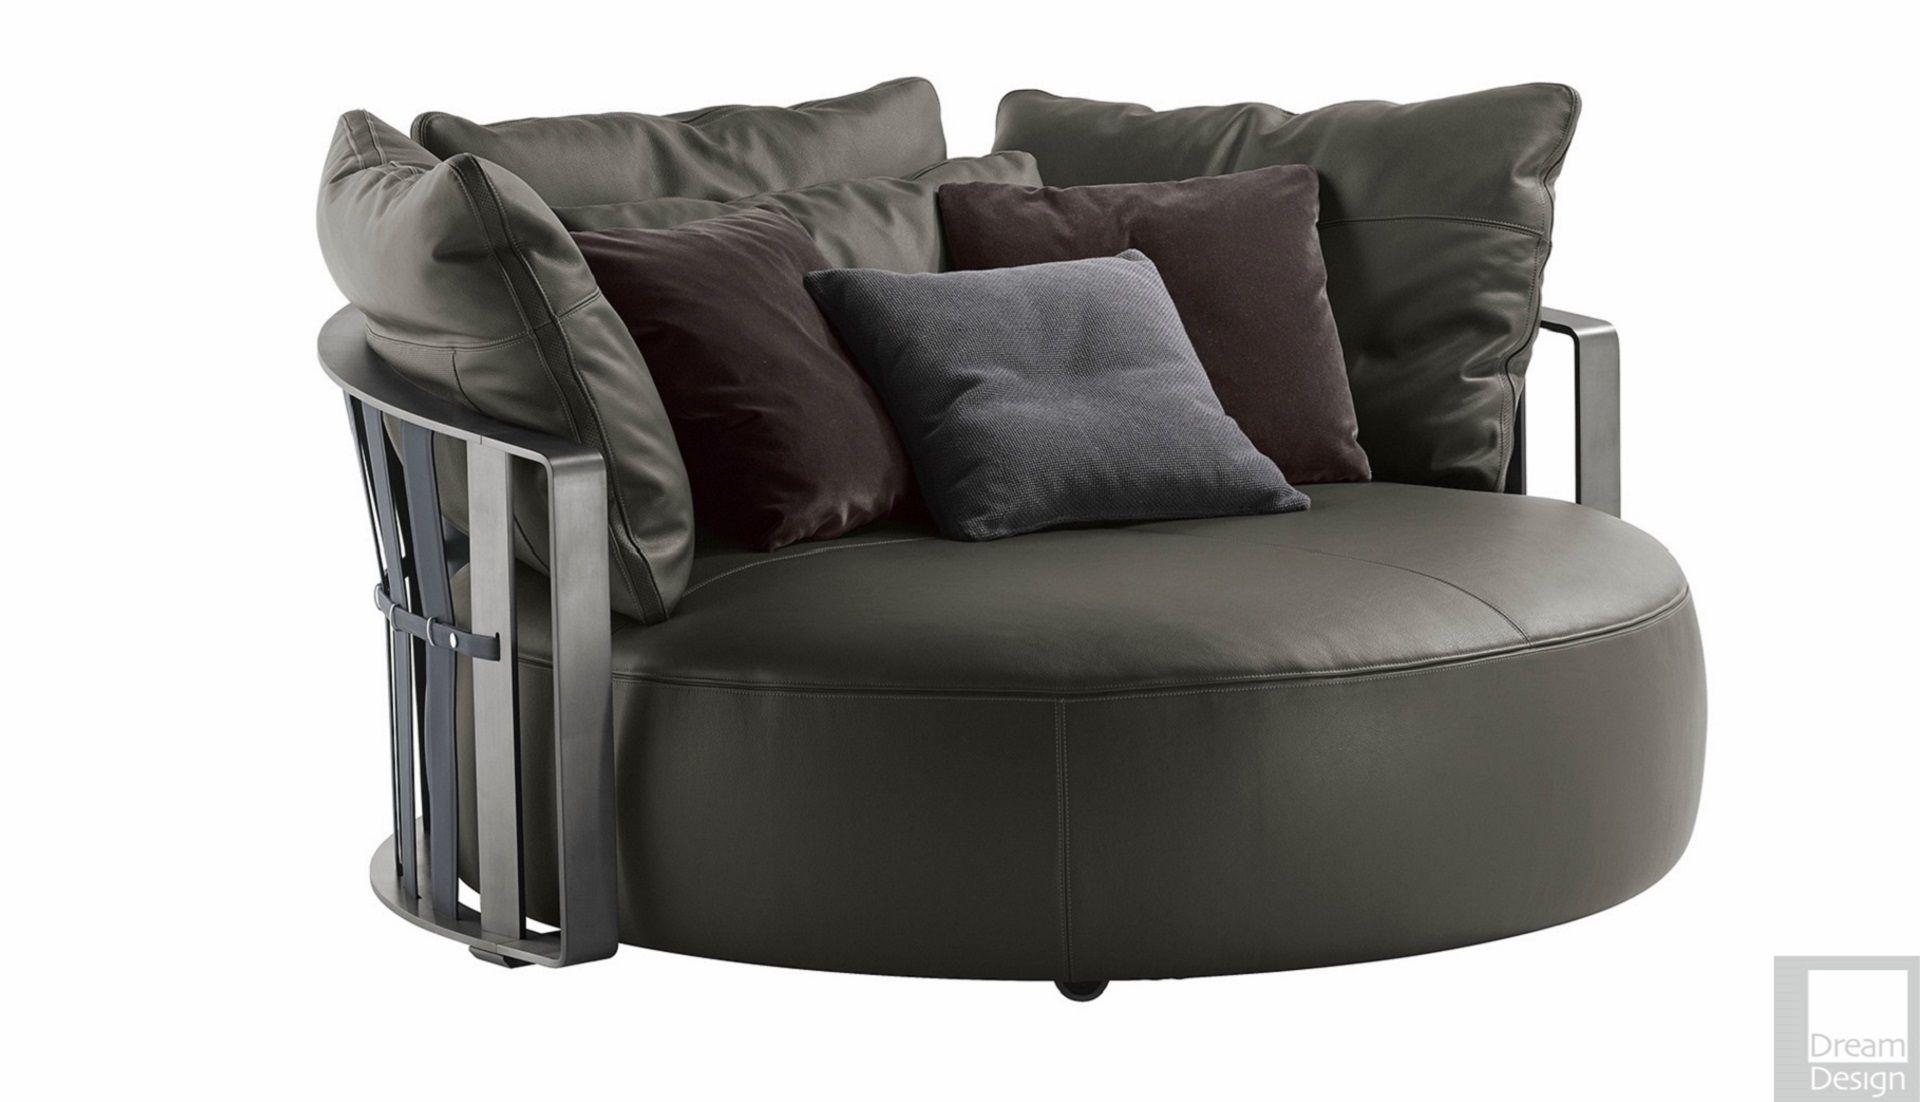 Poltrona Frau Pillow.Poltrona Frau Scarlett Sofa By Jean Marie Massaud Ebo